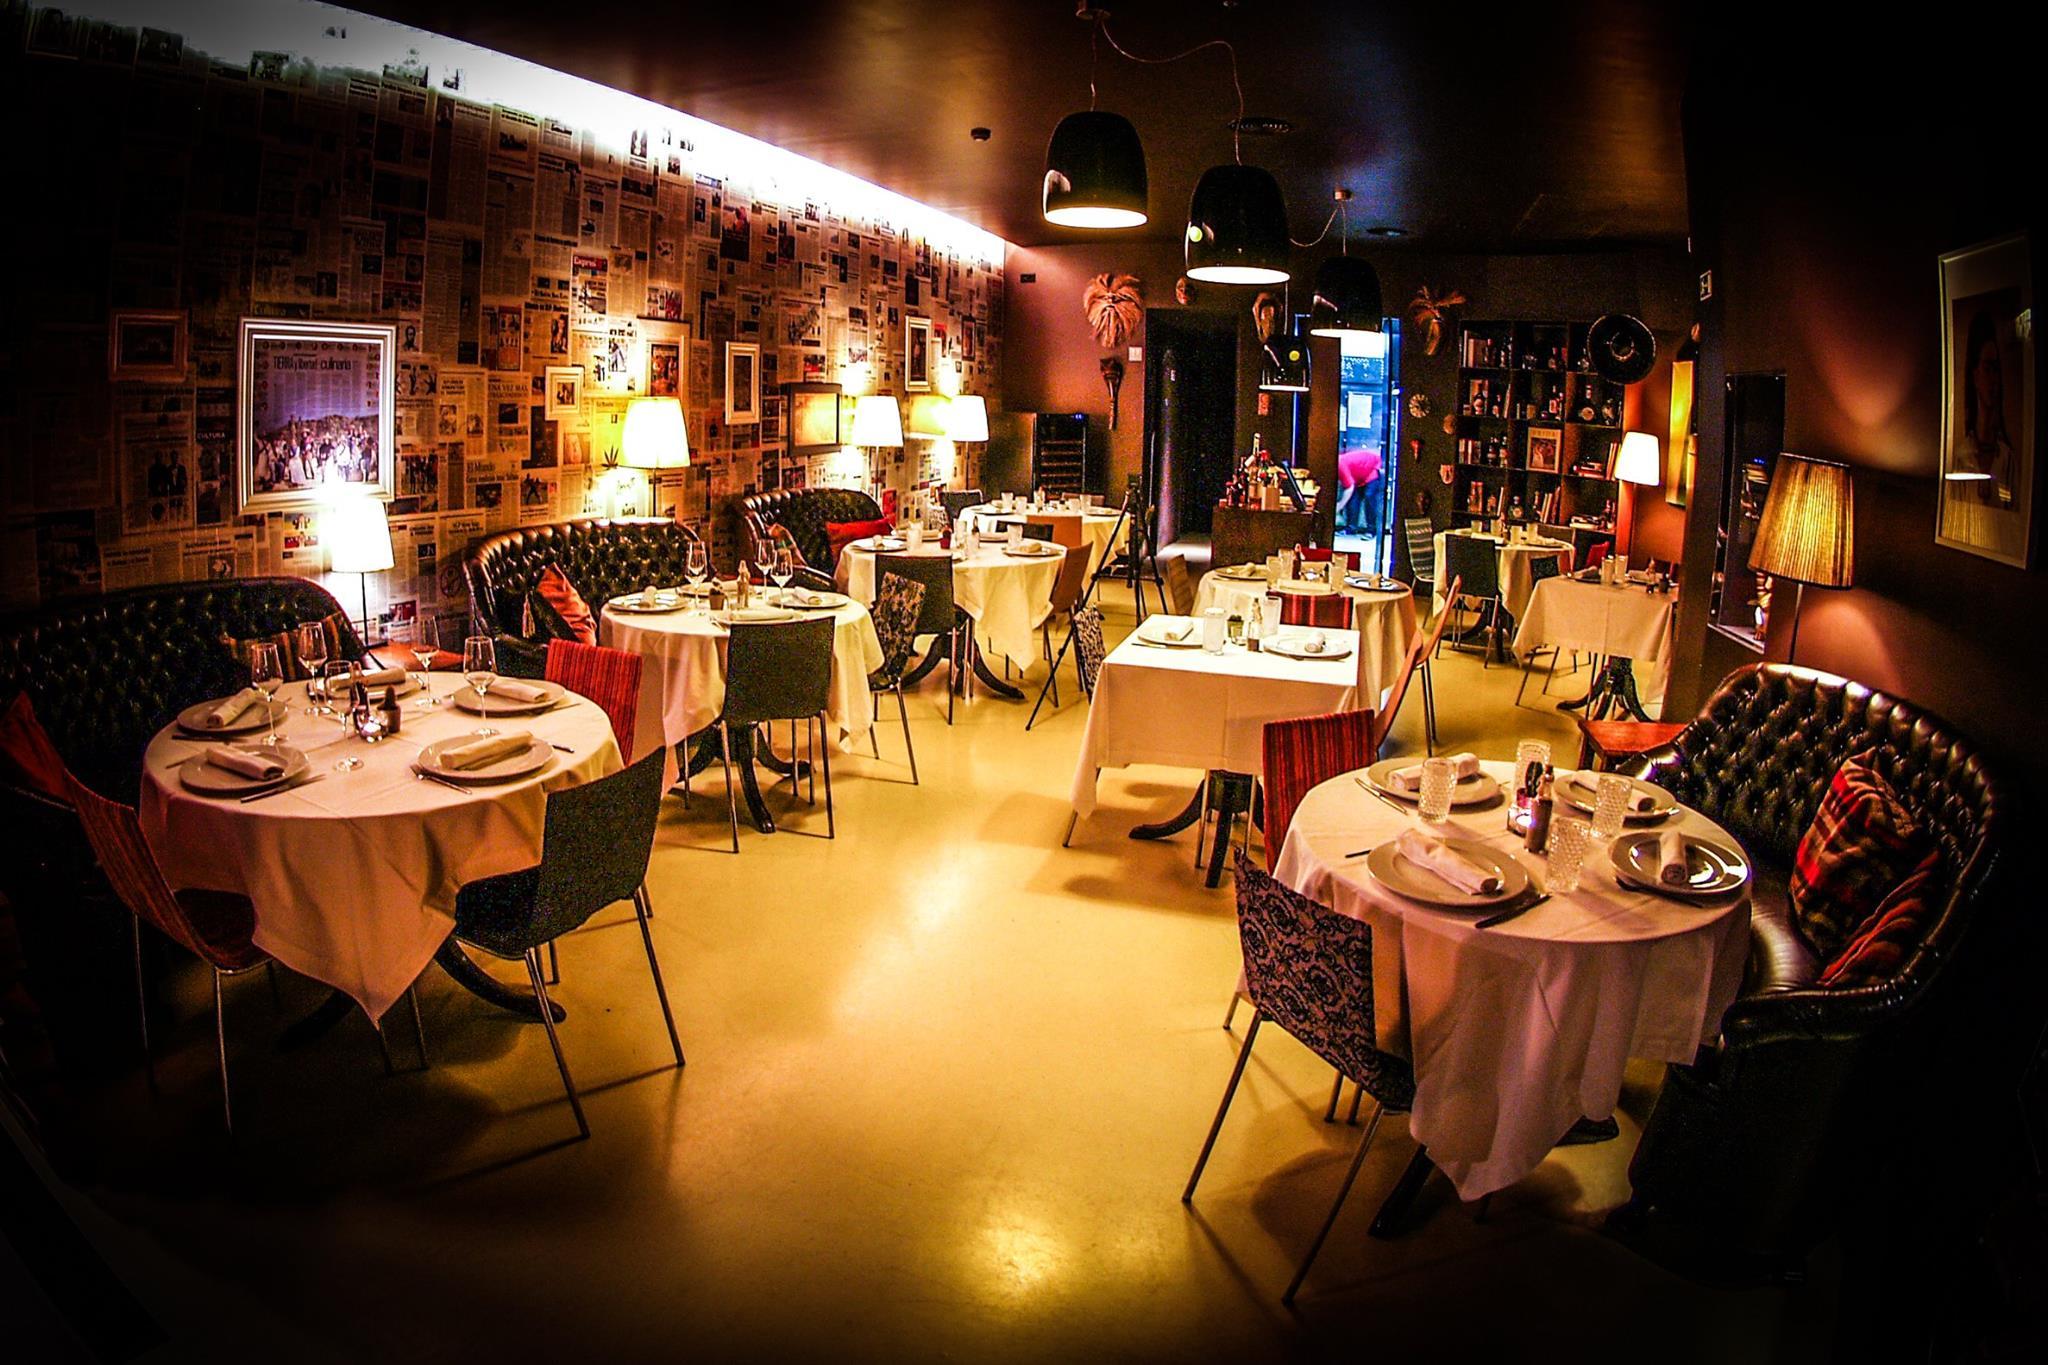 Salle du restaurant mexicain Frida - Porto